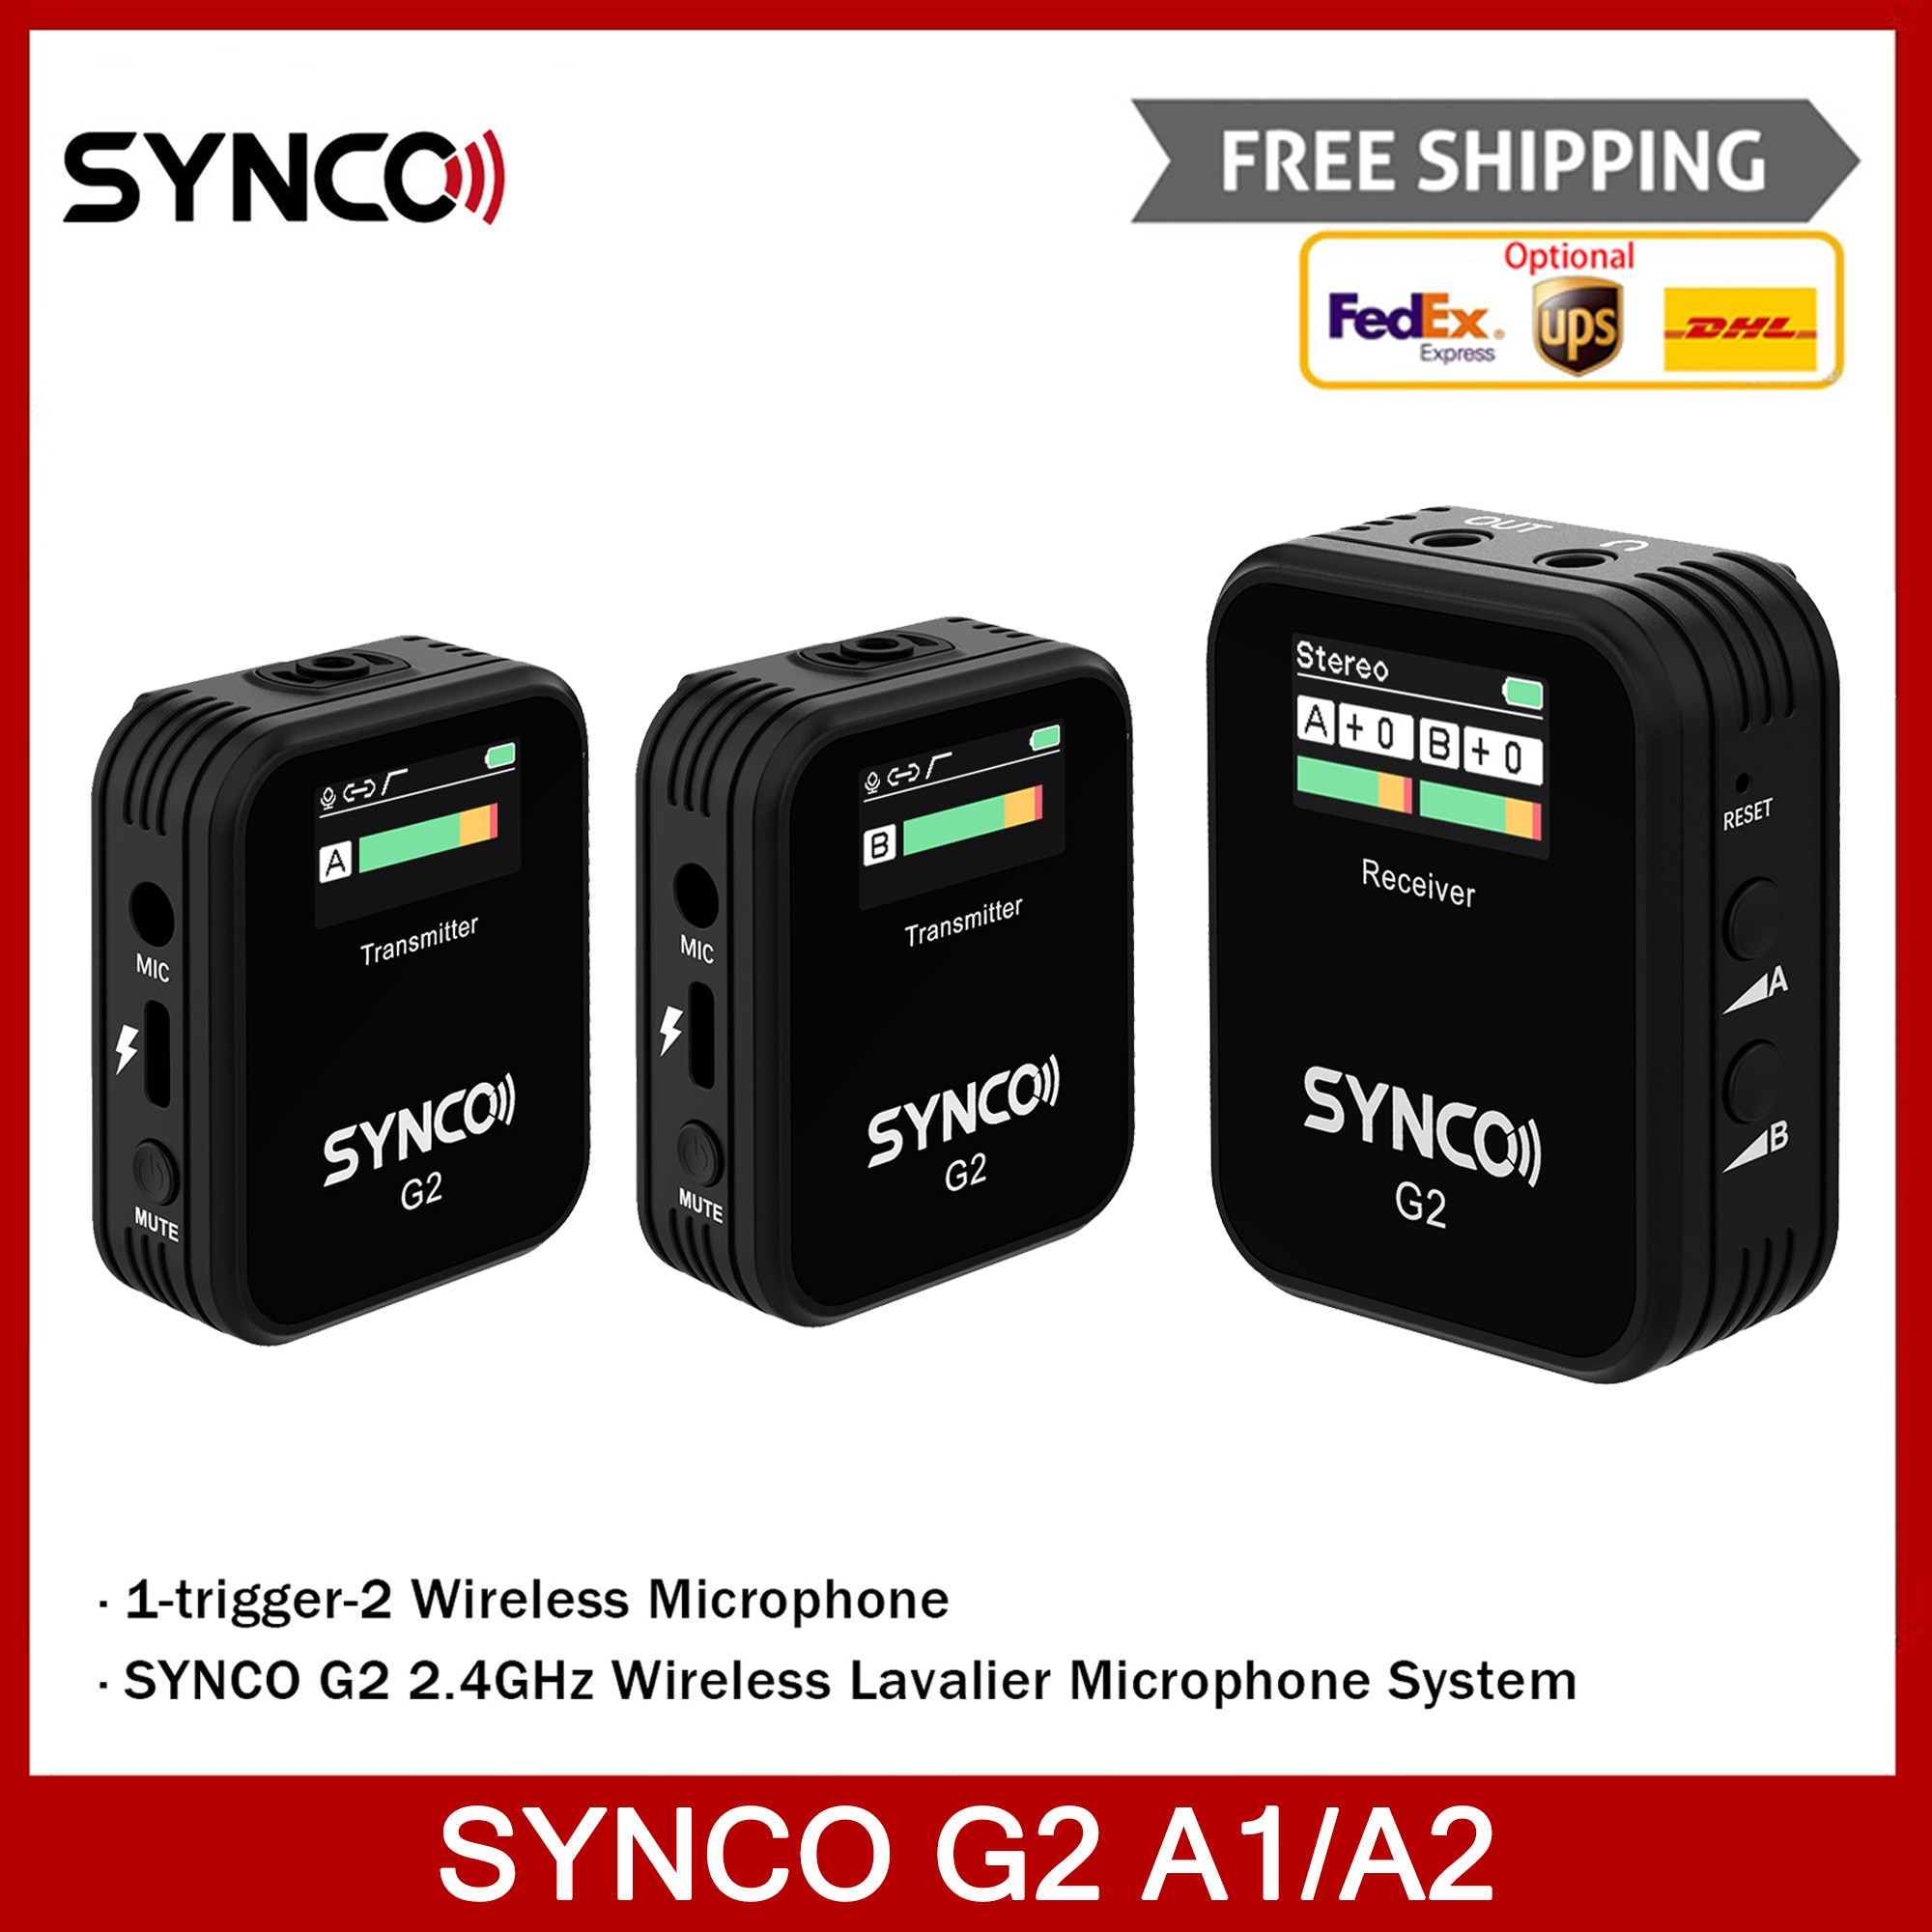 SYNCO G2 A1/A2 مكثف ميكروفون نظام ميكروفون لاسلكي Lavalier للهواتف الذكية DSLR كاميرا مراقبة الوقت الحقيقي انتقال 70 متر